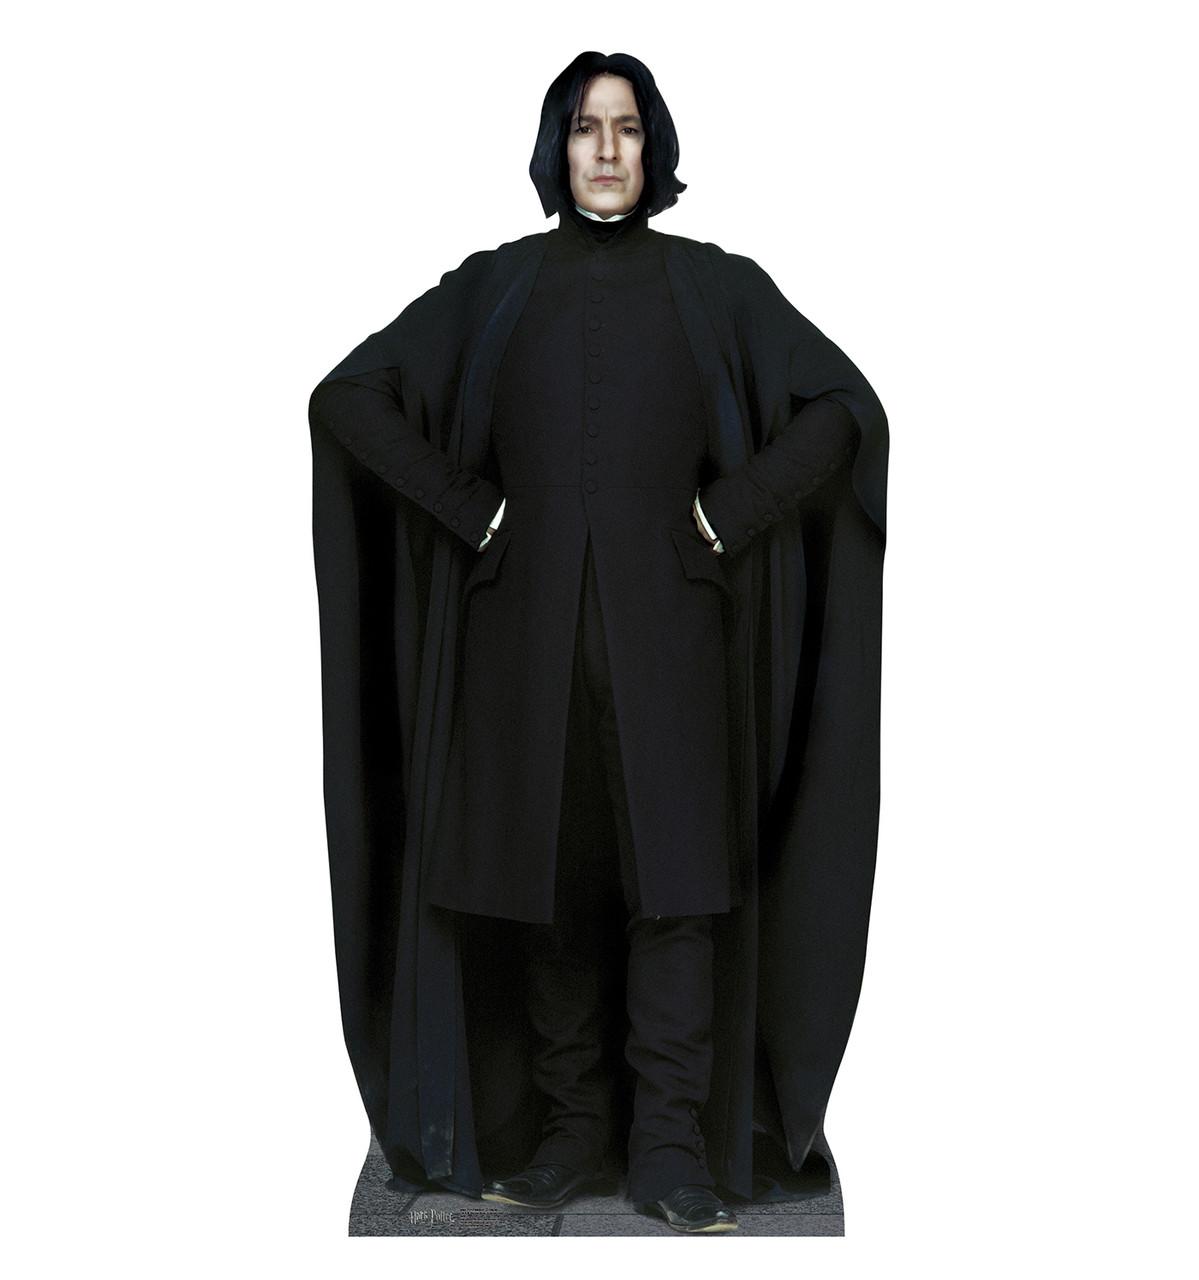 Life-size Professor Snape Cardboard Standup